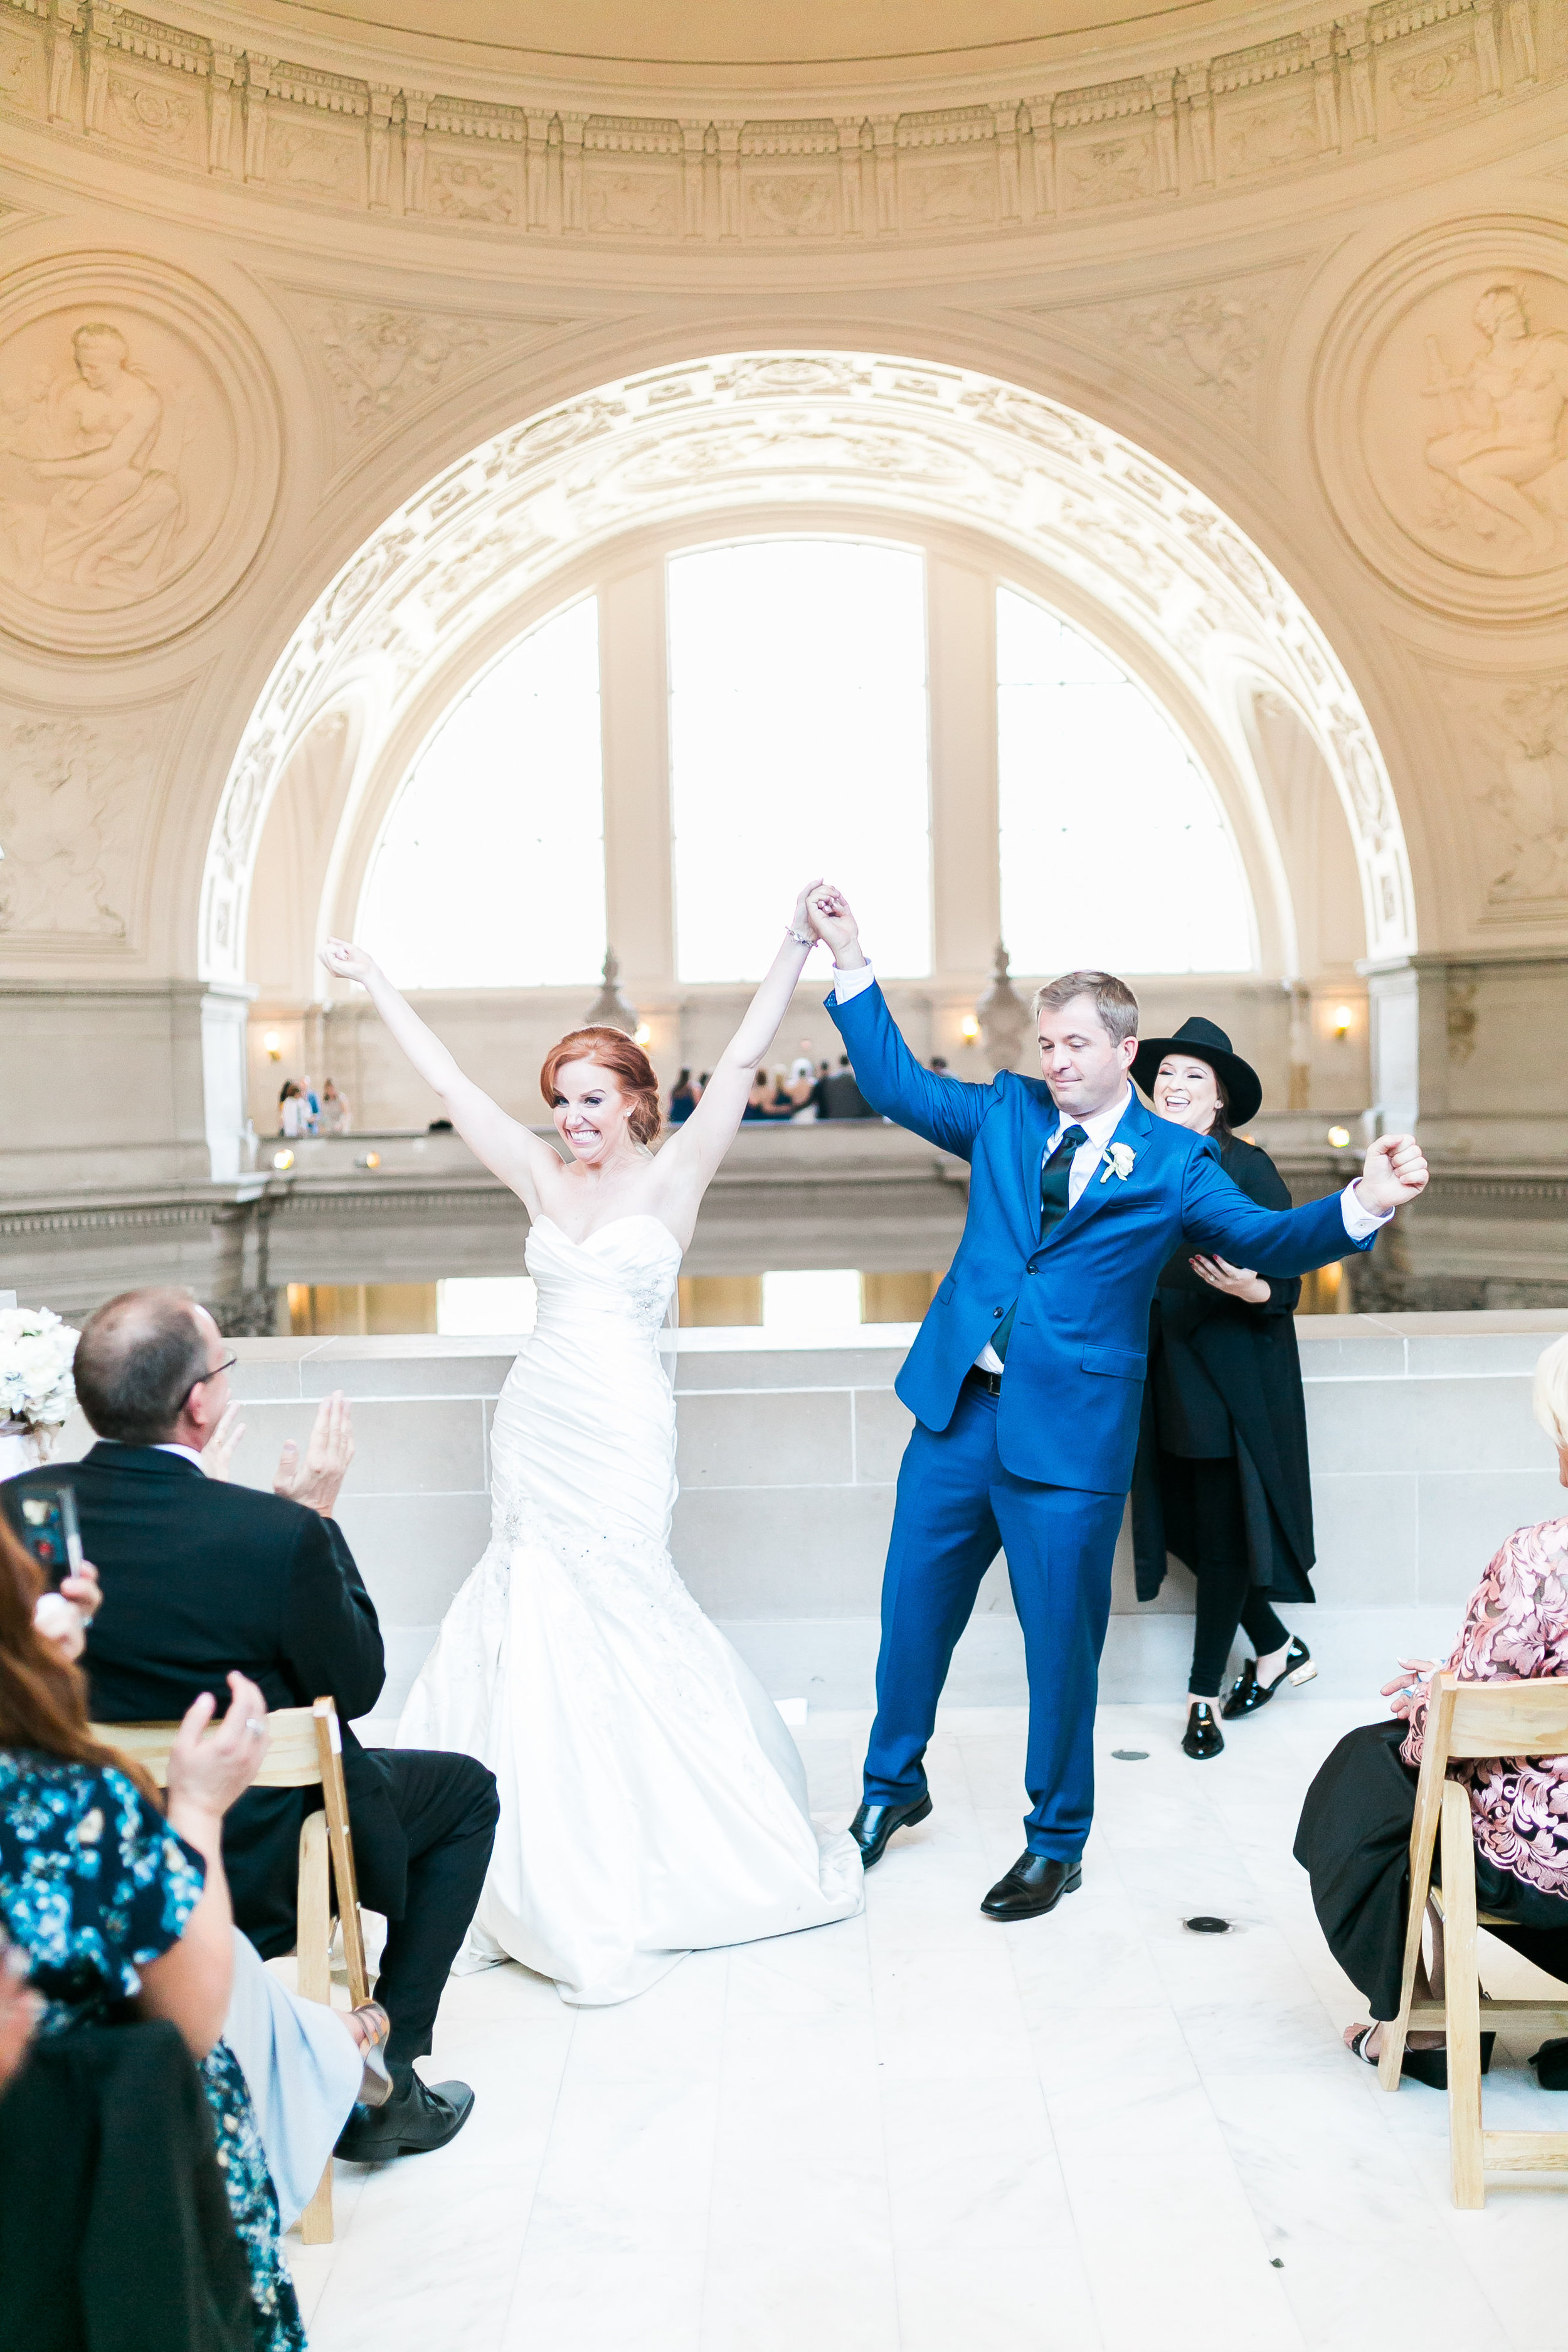 Mr. and Mrs. Wedding Day Las Vegas Wedding Planner.jpg